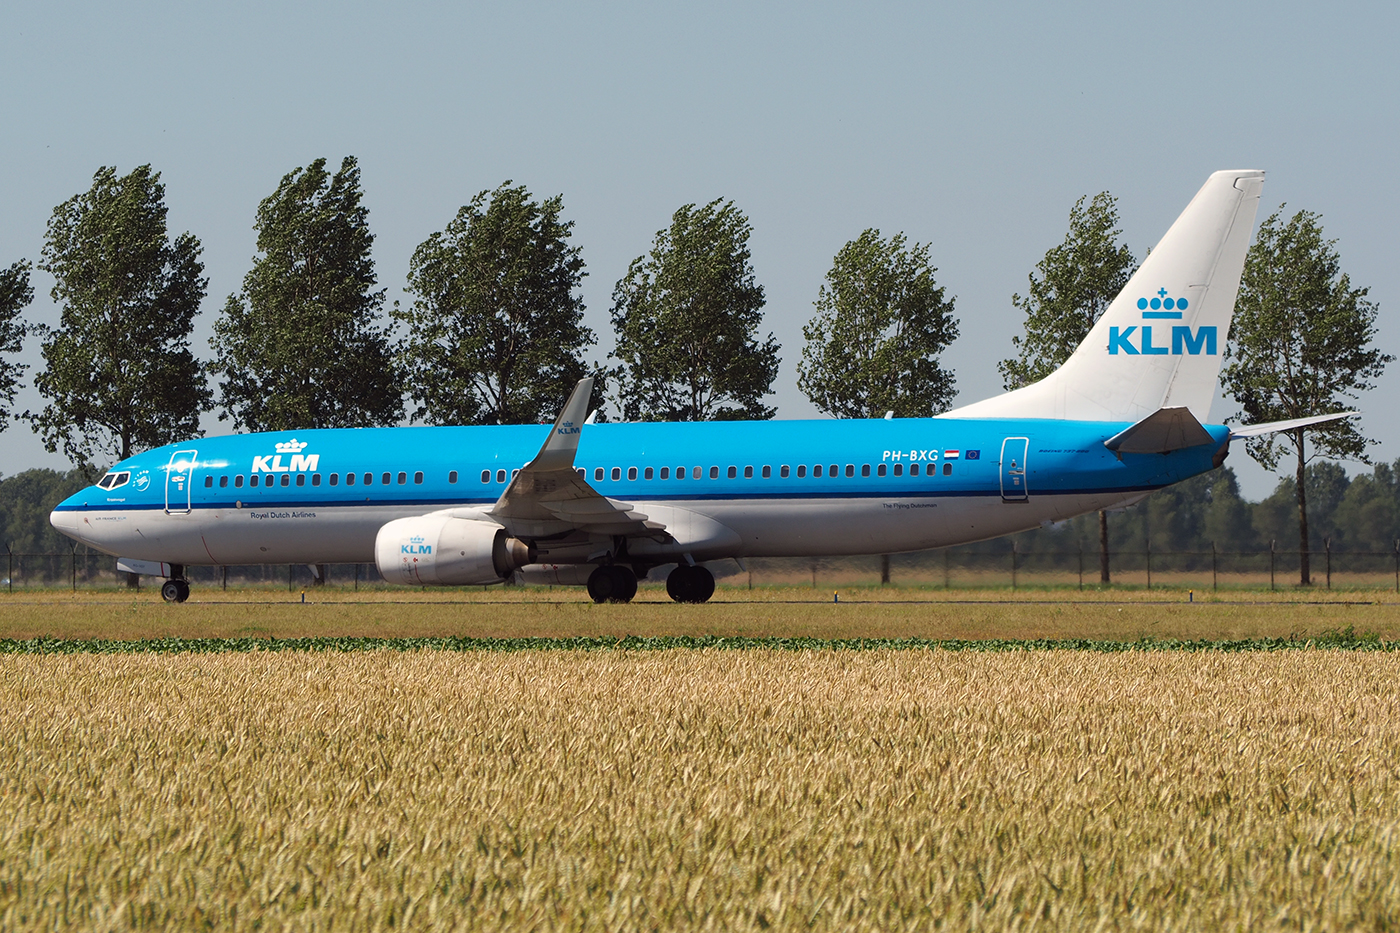 PH-BXG, KLM, B737-800